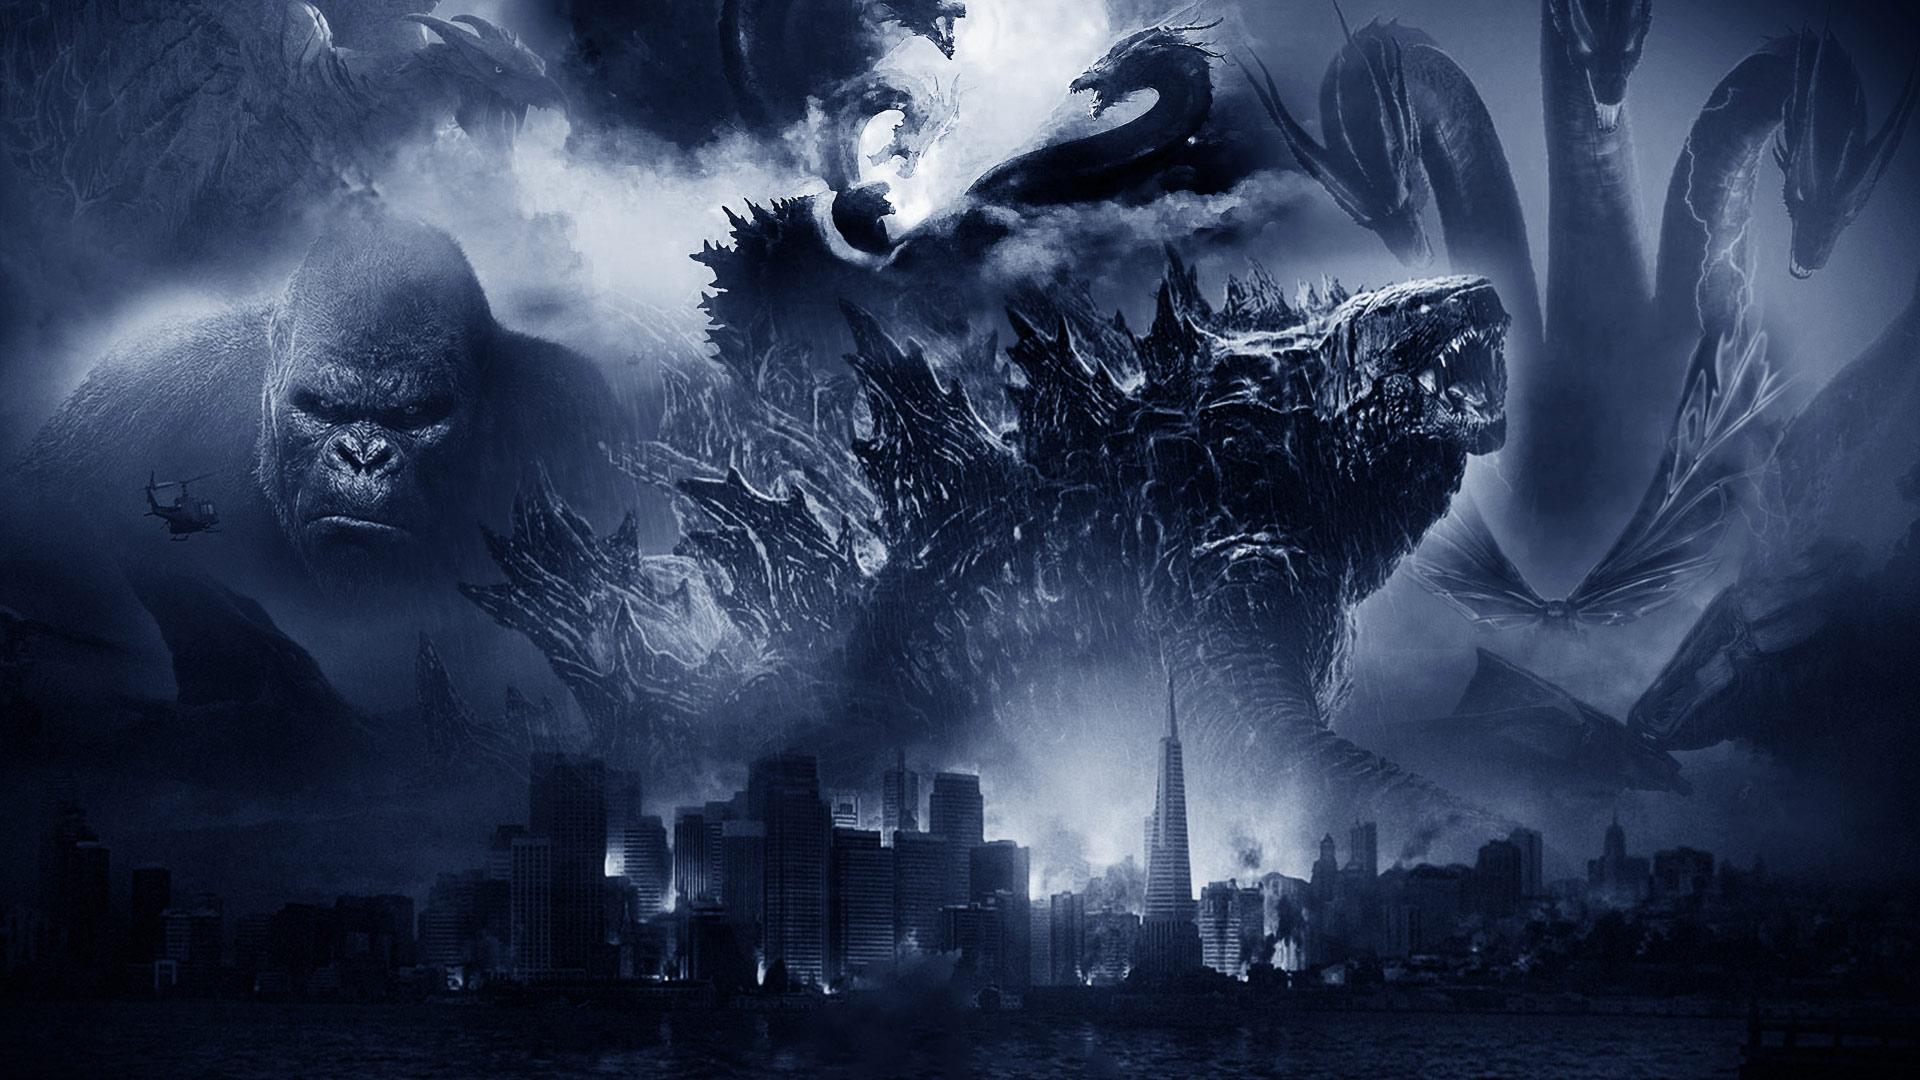 I 5 migliori classici horror targati Universal 7